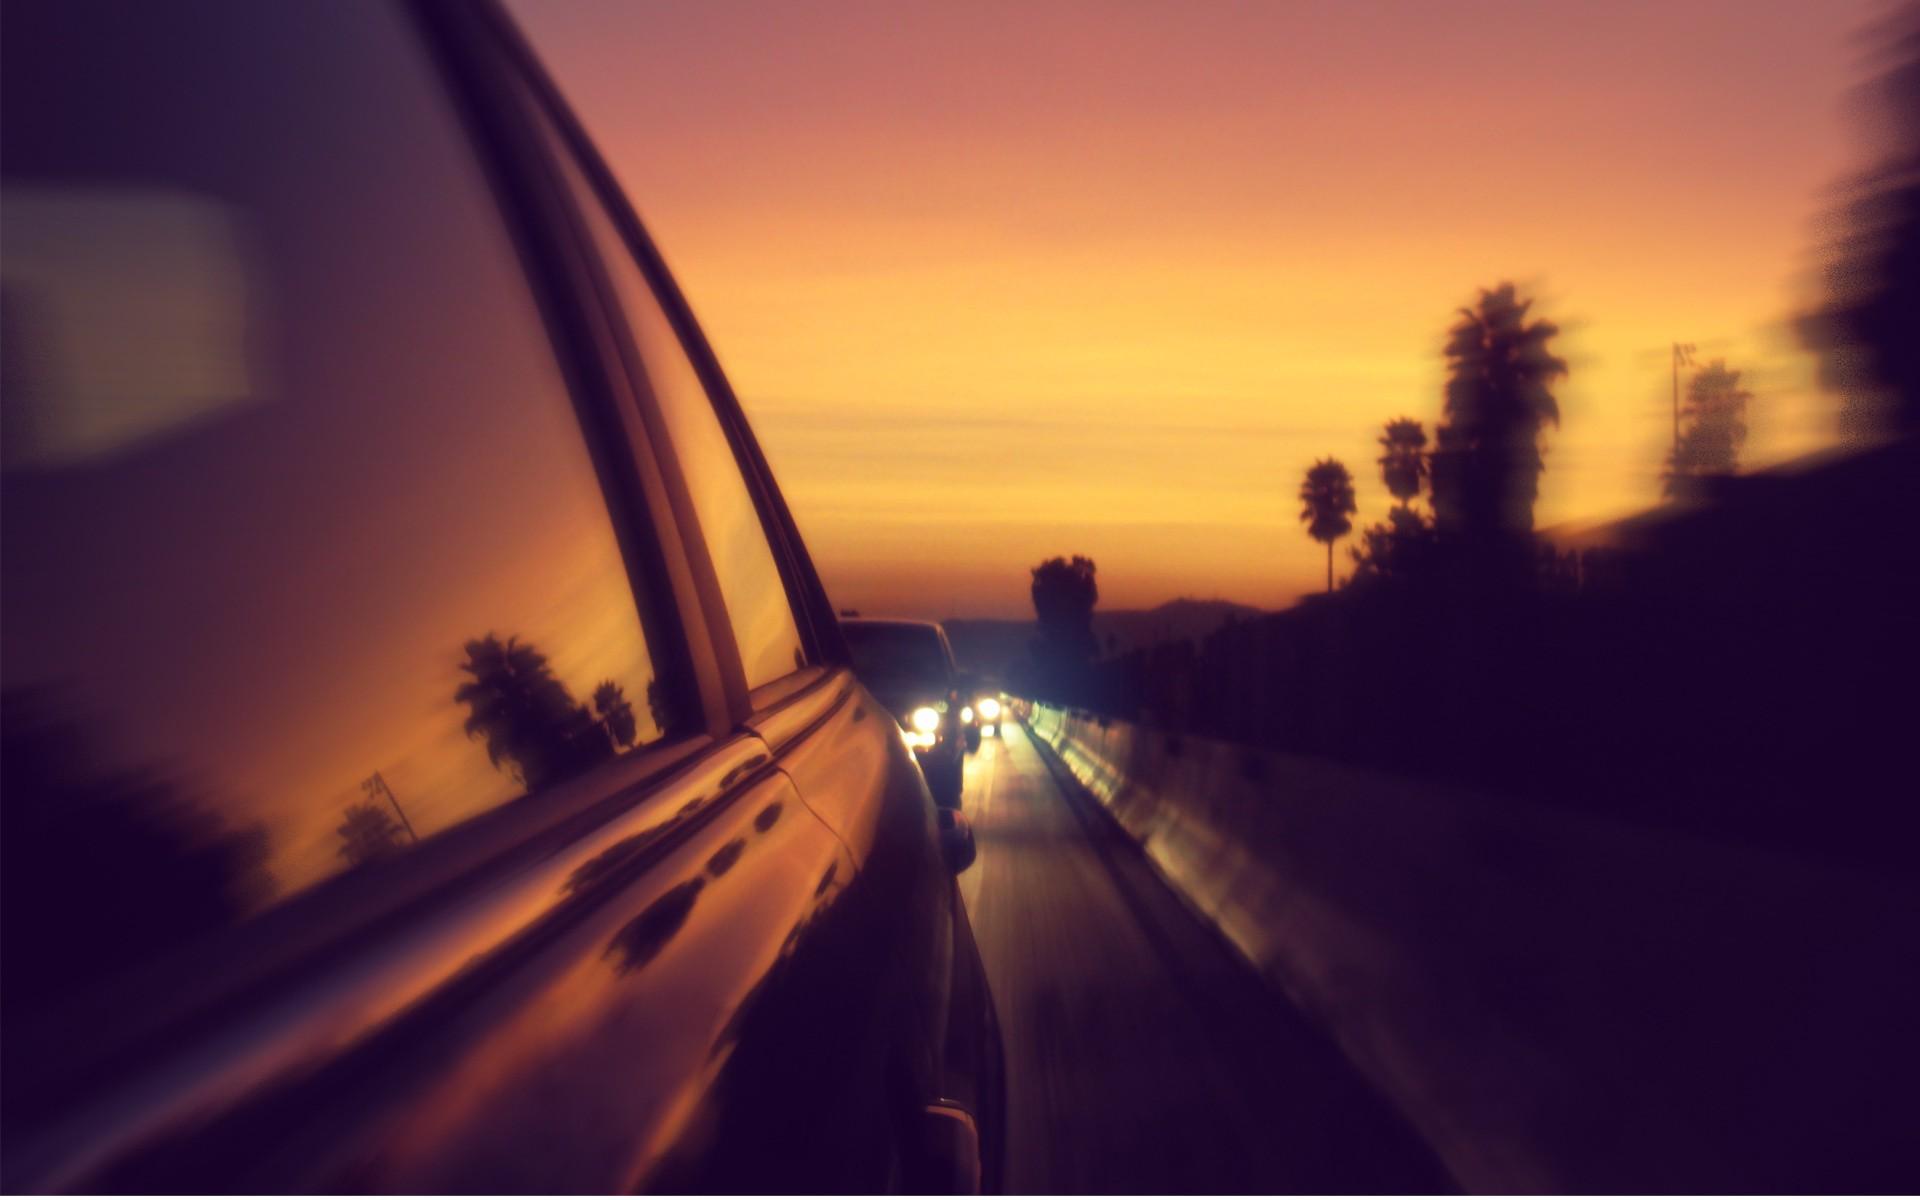 ВТольятти нетрезвый  шофёр  вез приятеля скорпоратива вбагажнике авто